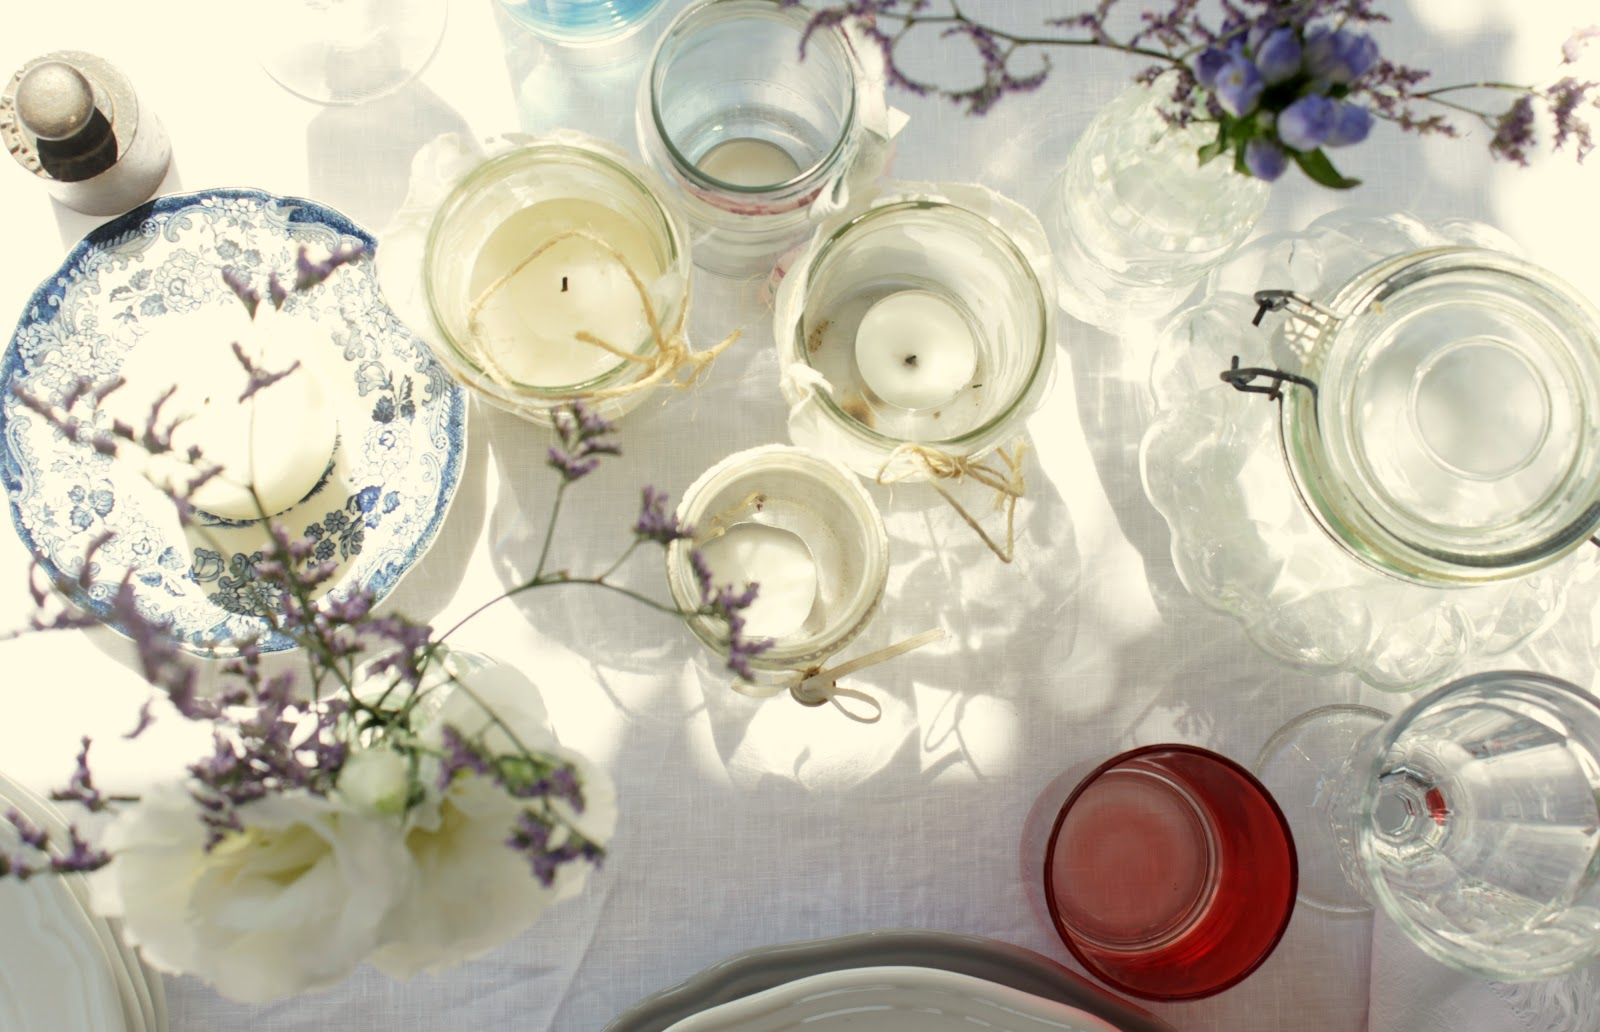 Shabby chic joy: #myhome: ottobrata romana e pranzo in terrazza.